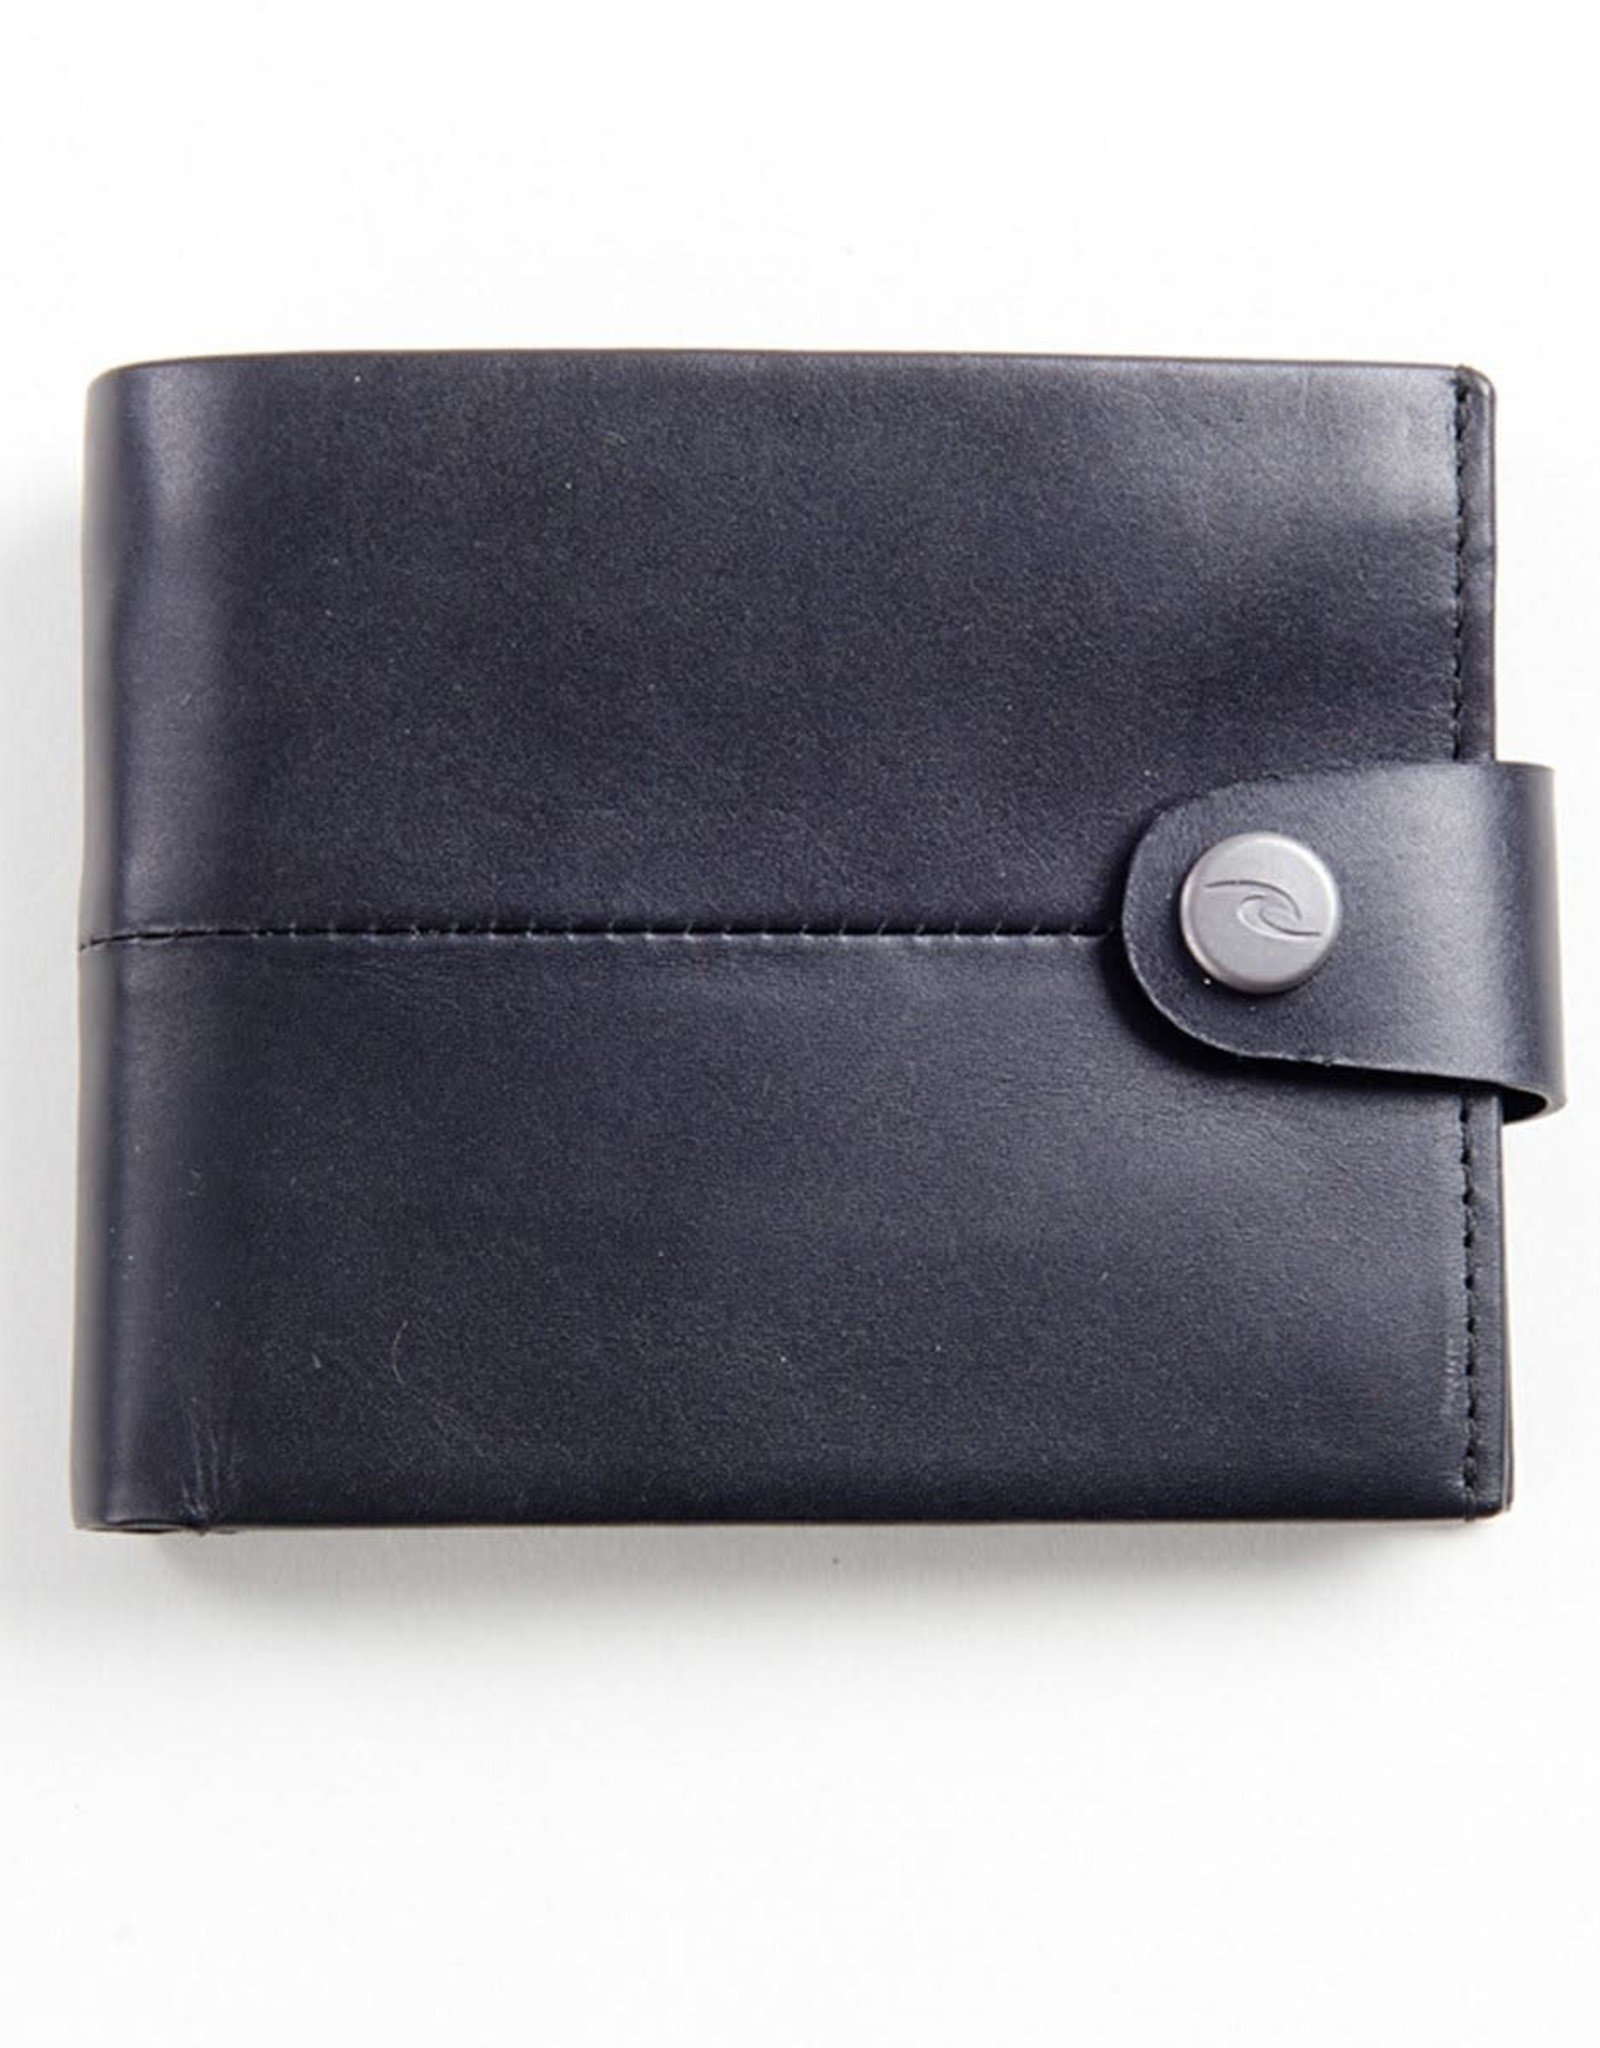 RIP CURL Snap Clip RFID 2 In 1 Wallet